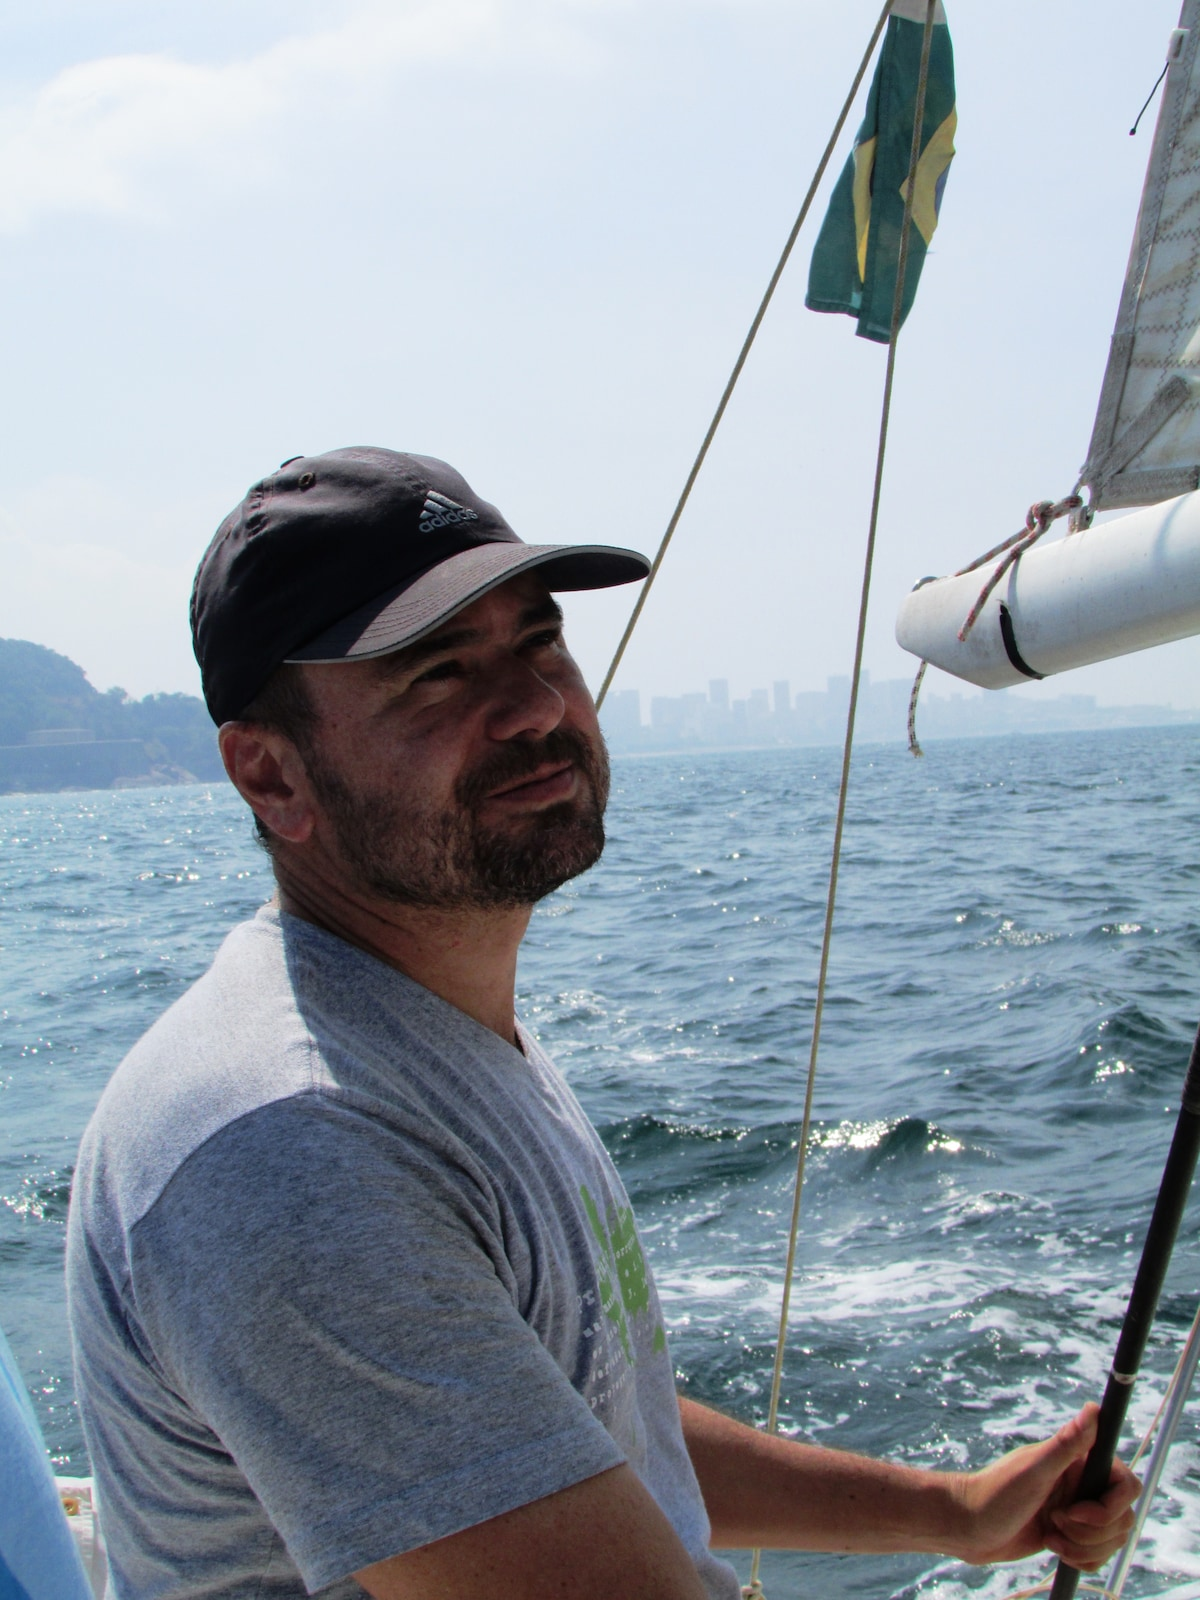 Luiz Carlos From Rio de Janeiro, Brazil